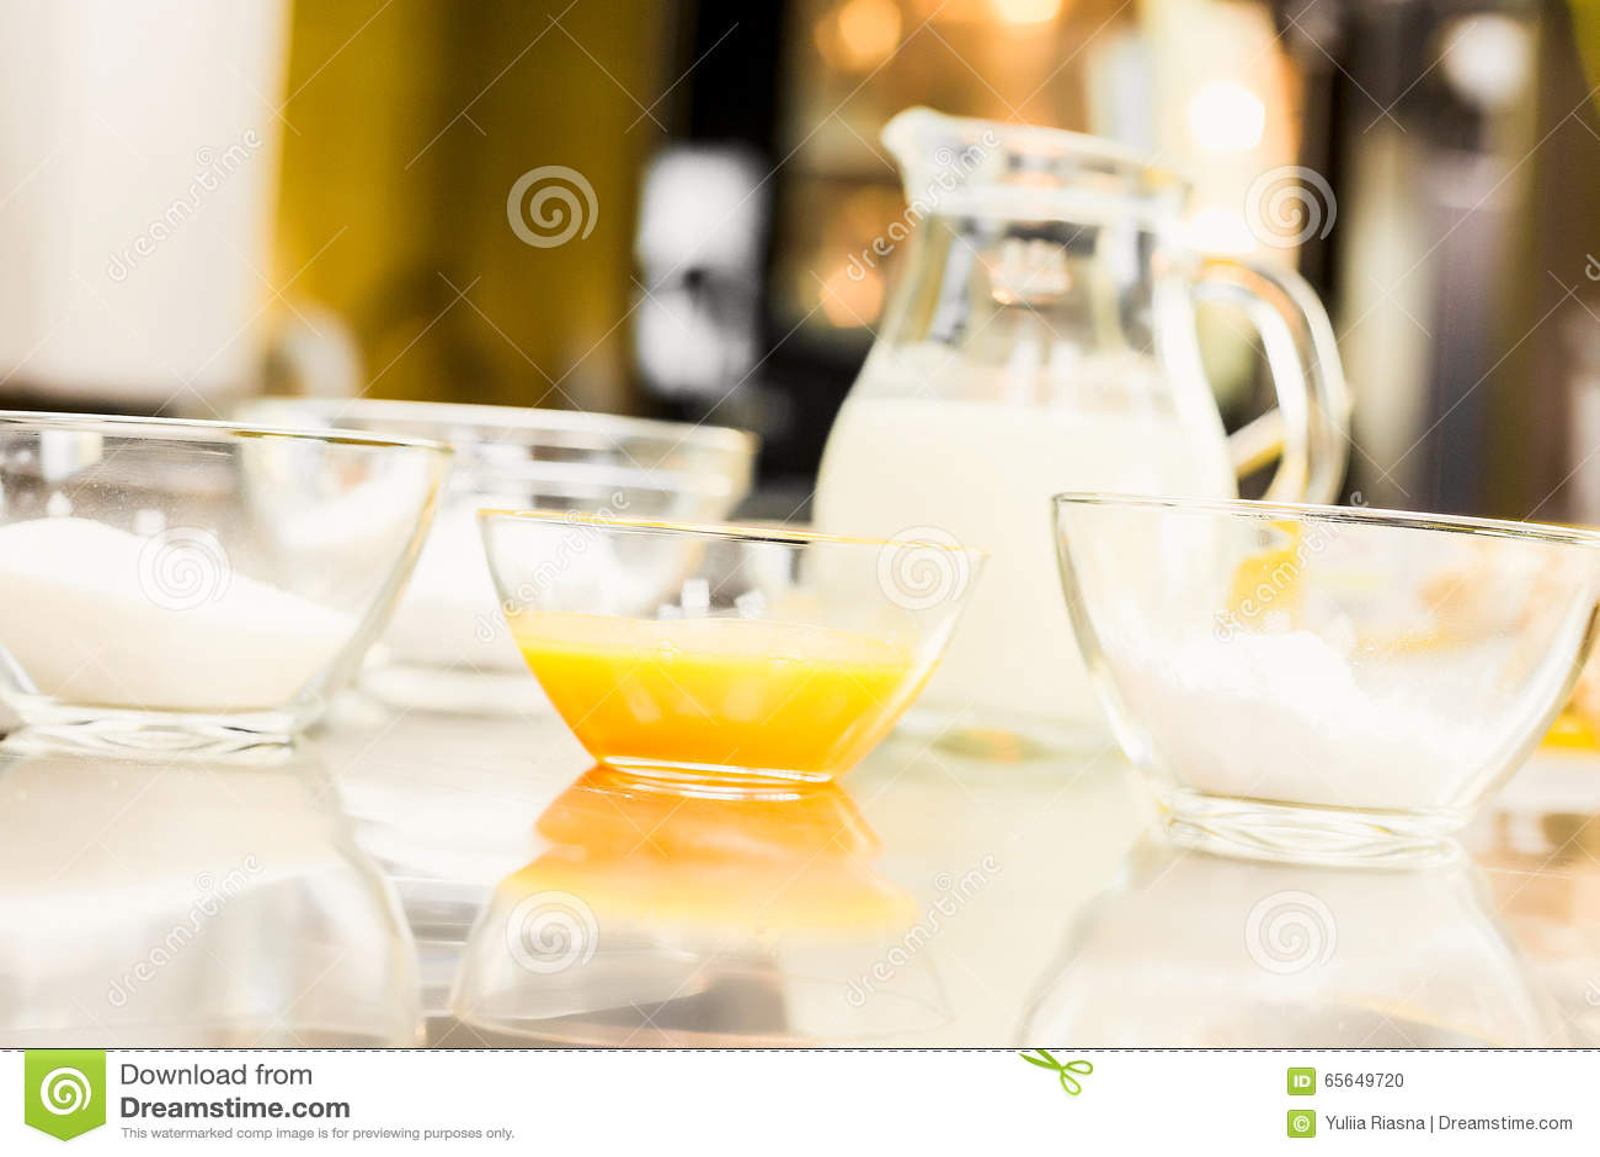 Стеклоизделие с яичками, сахар, мука Кувшин vodoy Кухня Na В магазине кондитерскаи